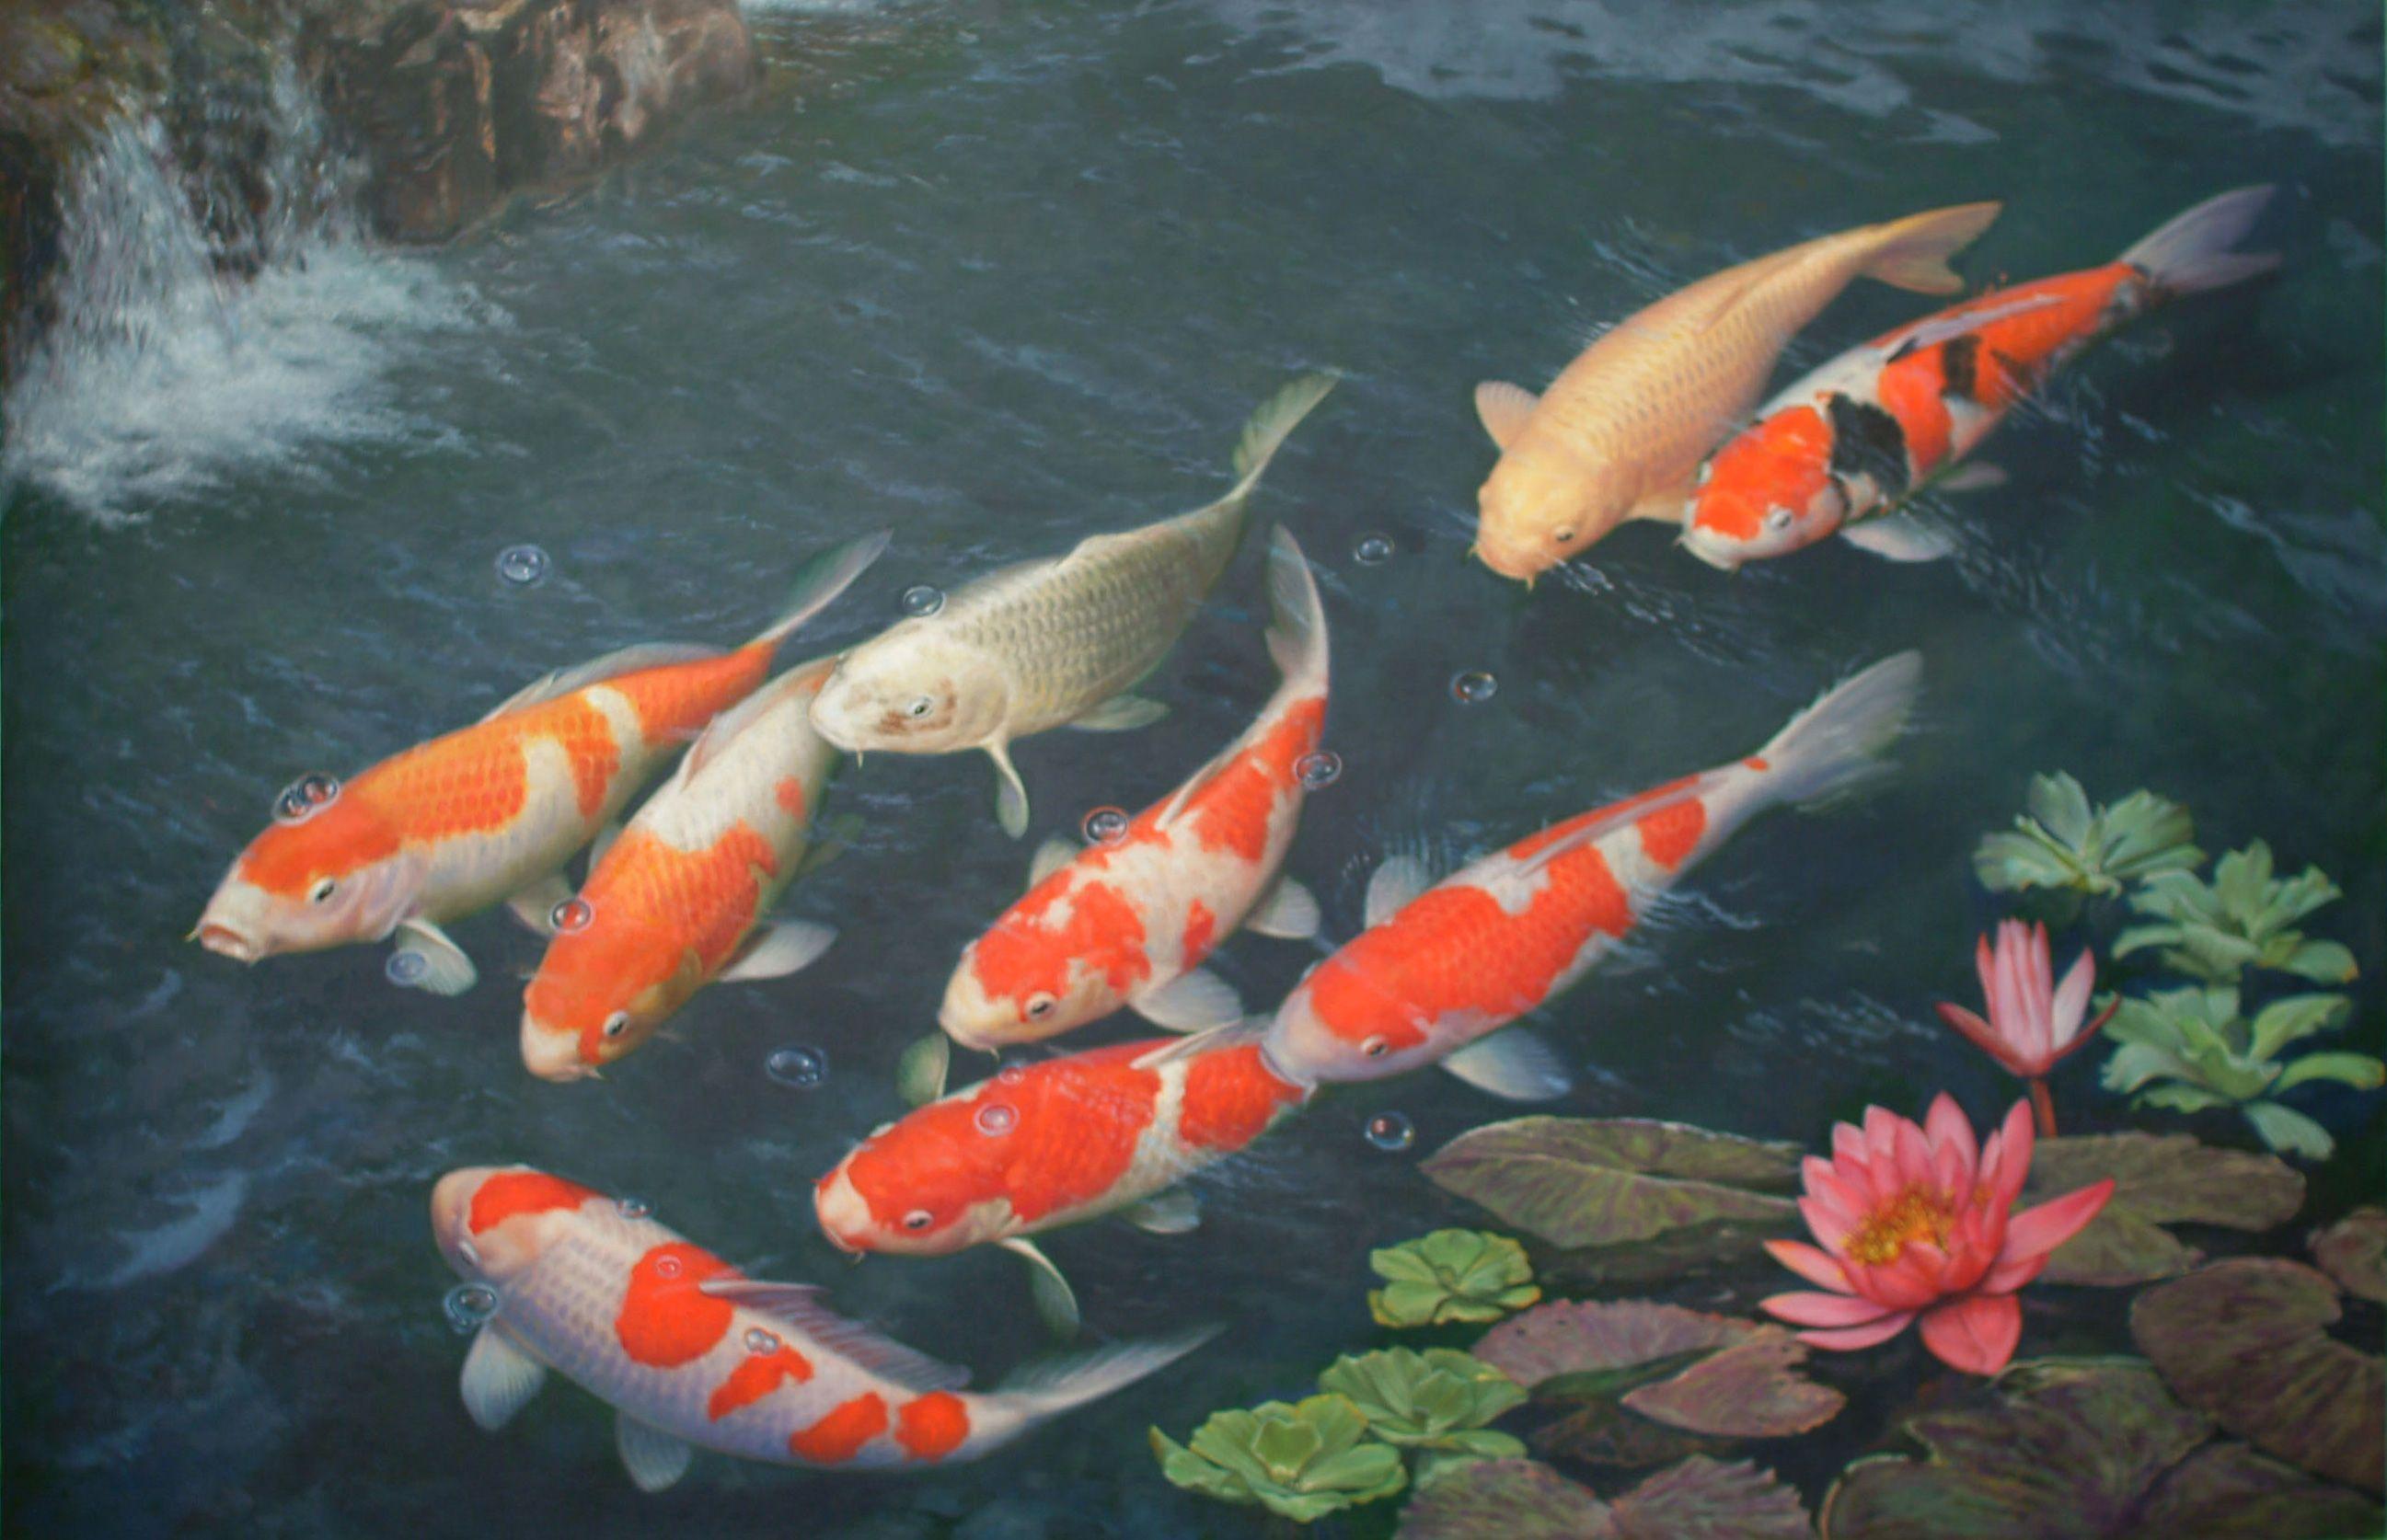 Walls Koi Fish Wallpaper Free Download Koi Fish Wallpaper Hd Koi Fish Koi Fish Koi Fish Colors Koi Fish Pond